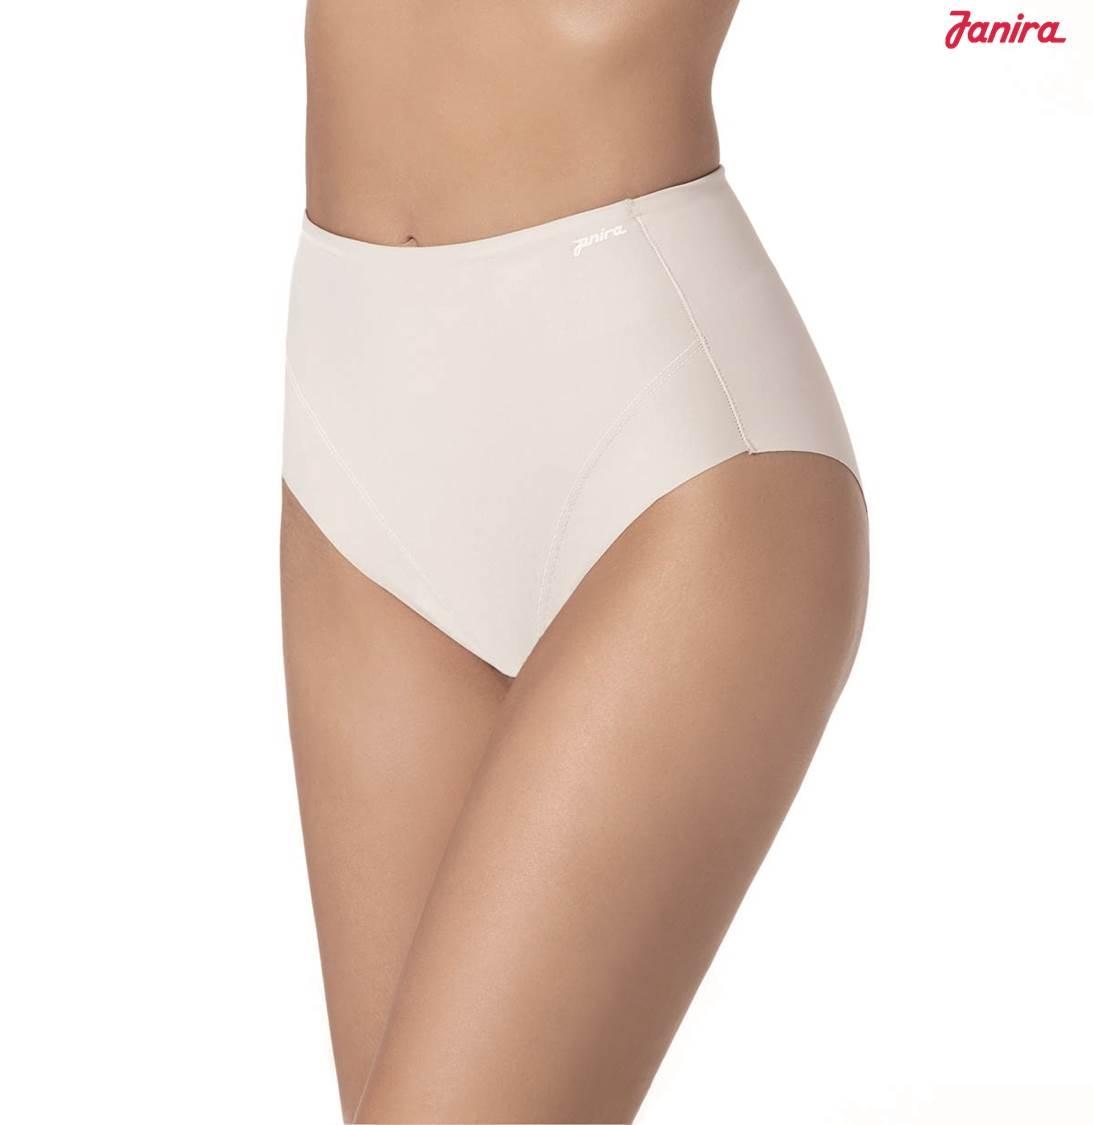 Braga Slip Form Perfect Curves Janira